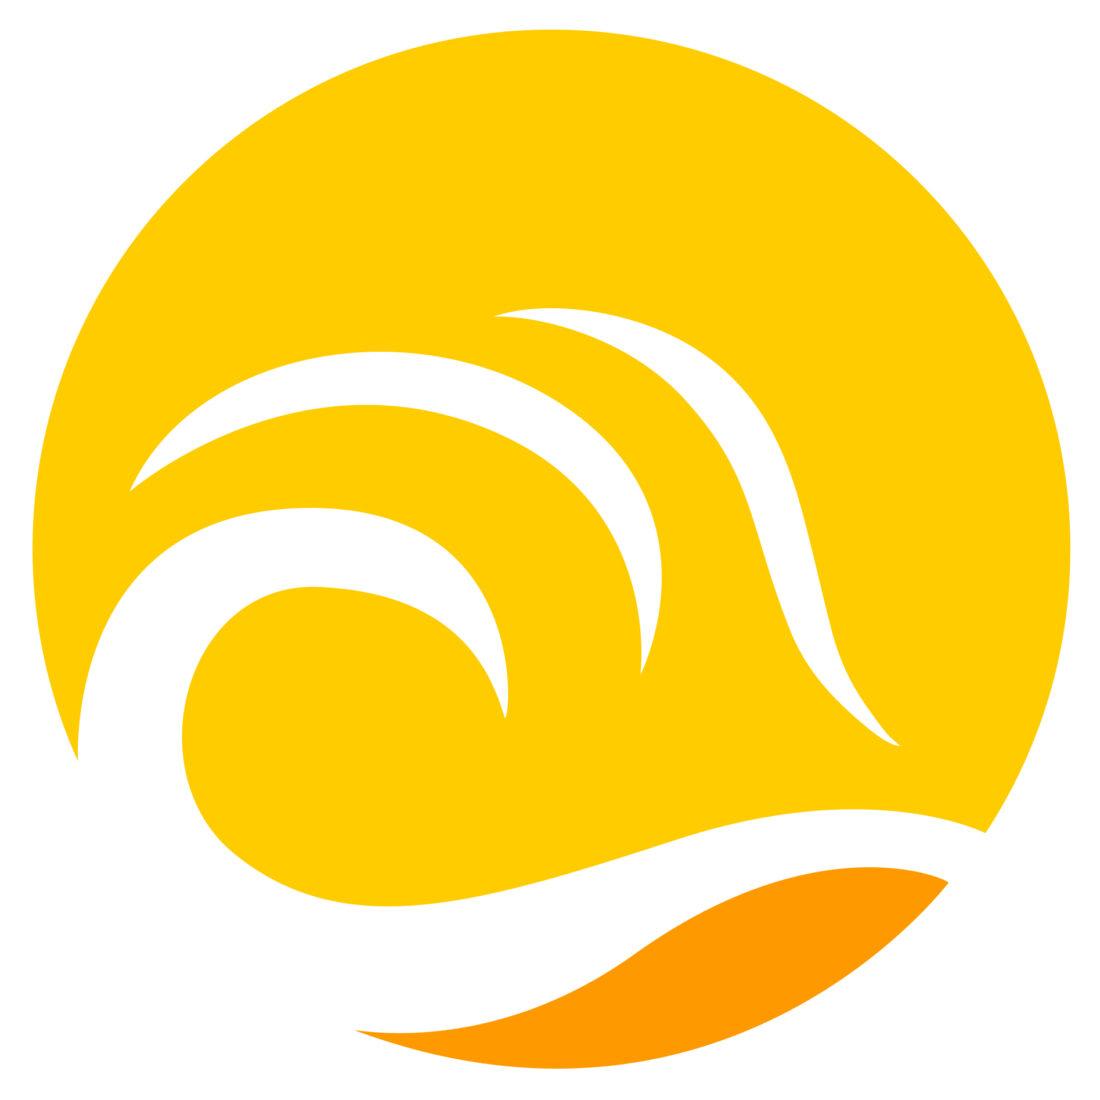 Shoreline-LFP Arts Council